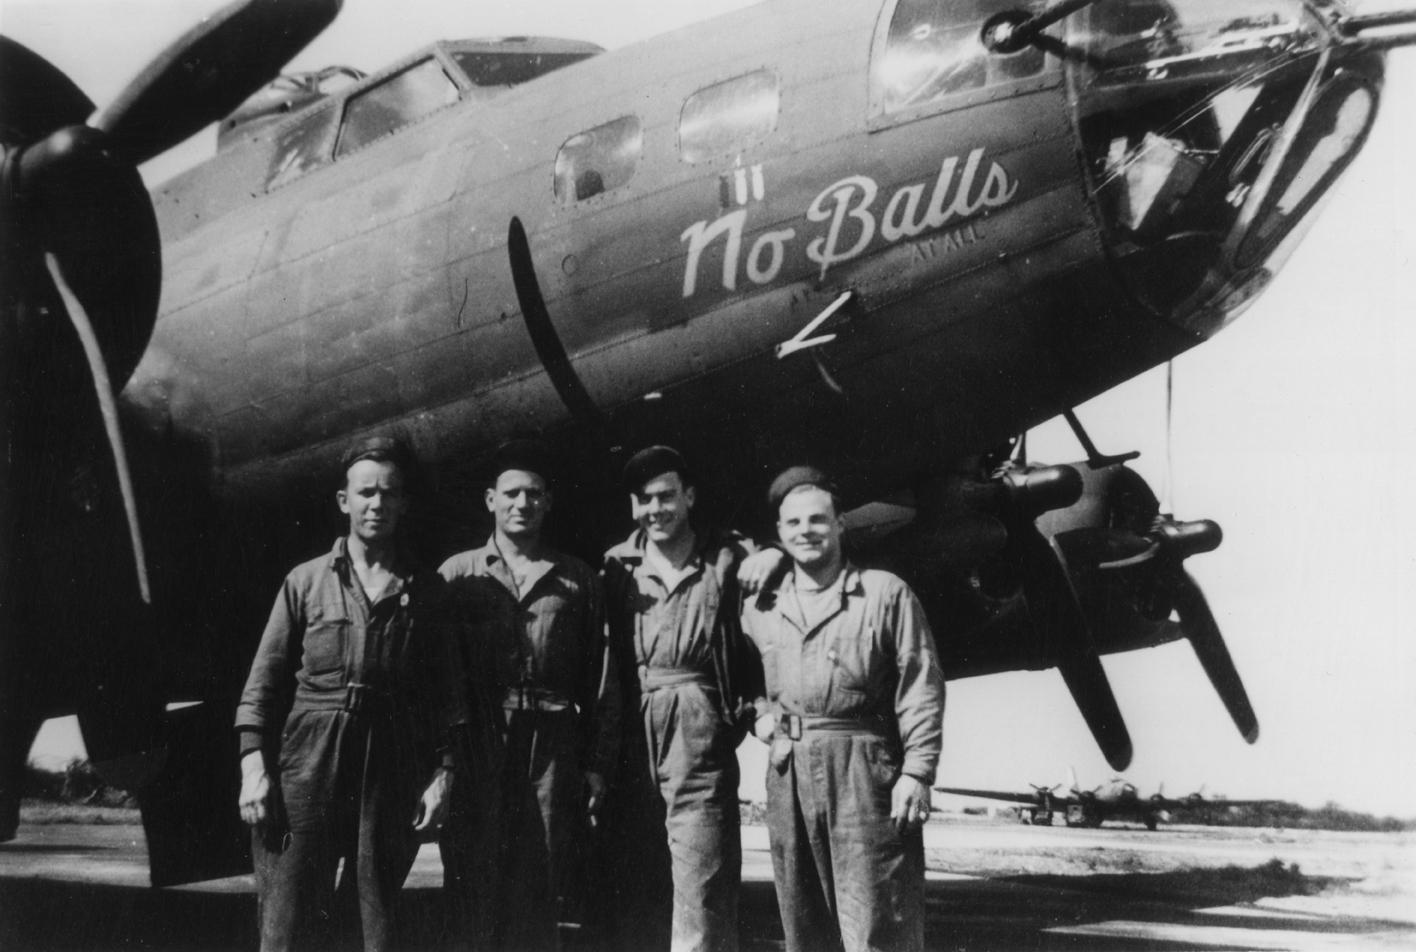 B-17 #42-3136 / Eight Ball aka No Balls At All